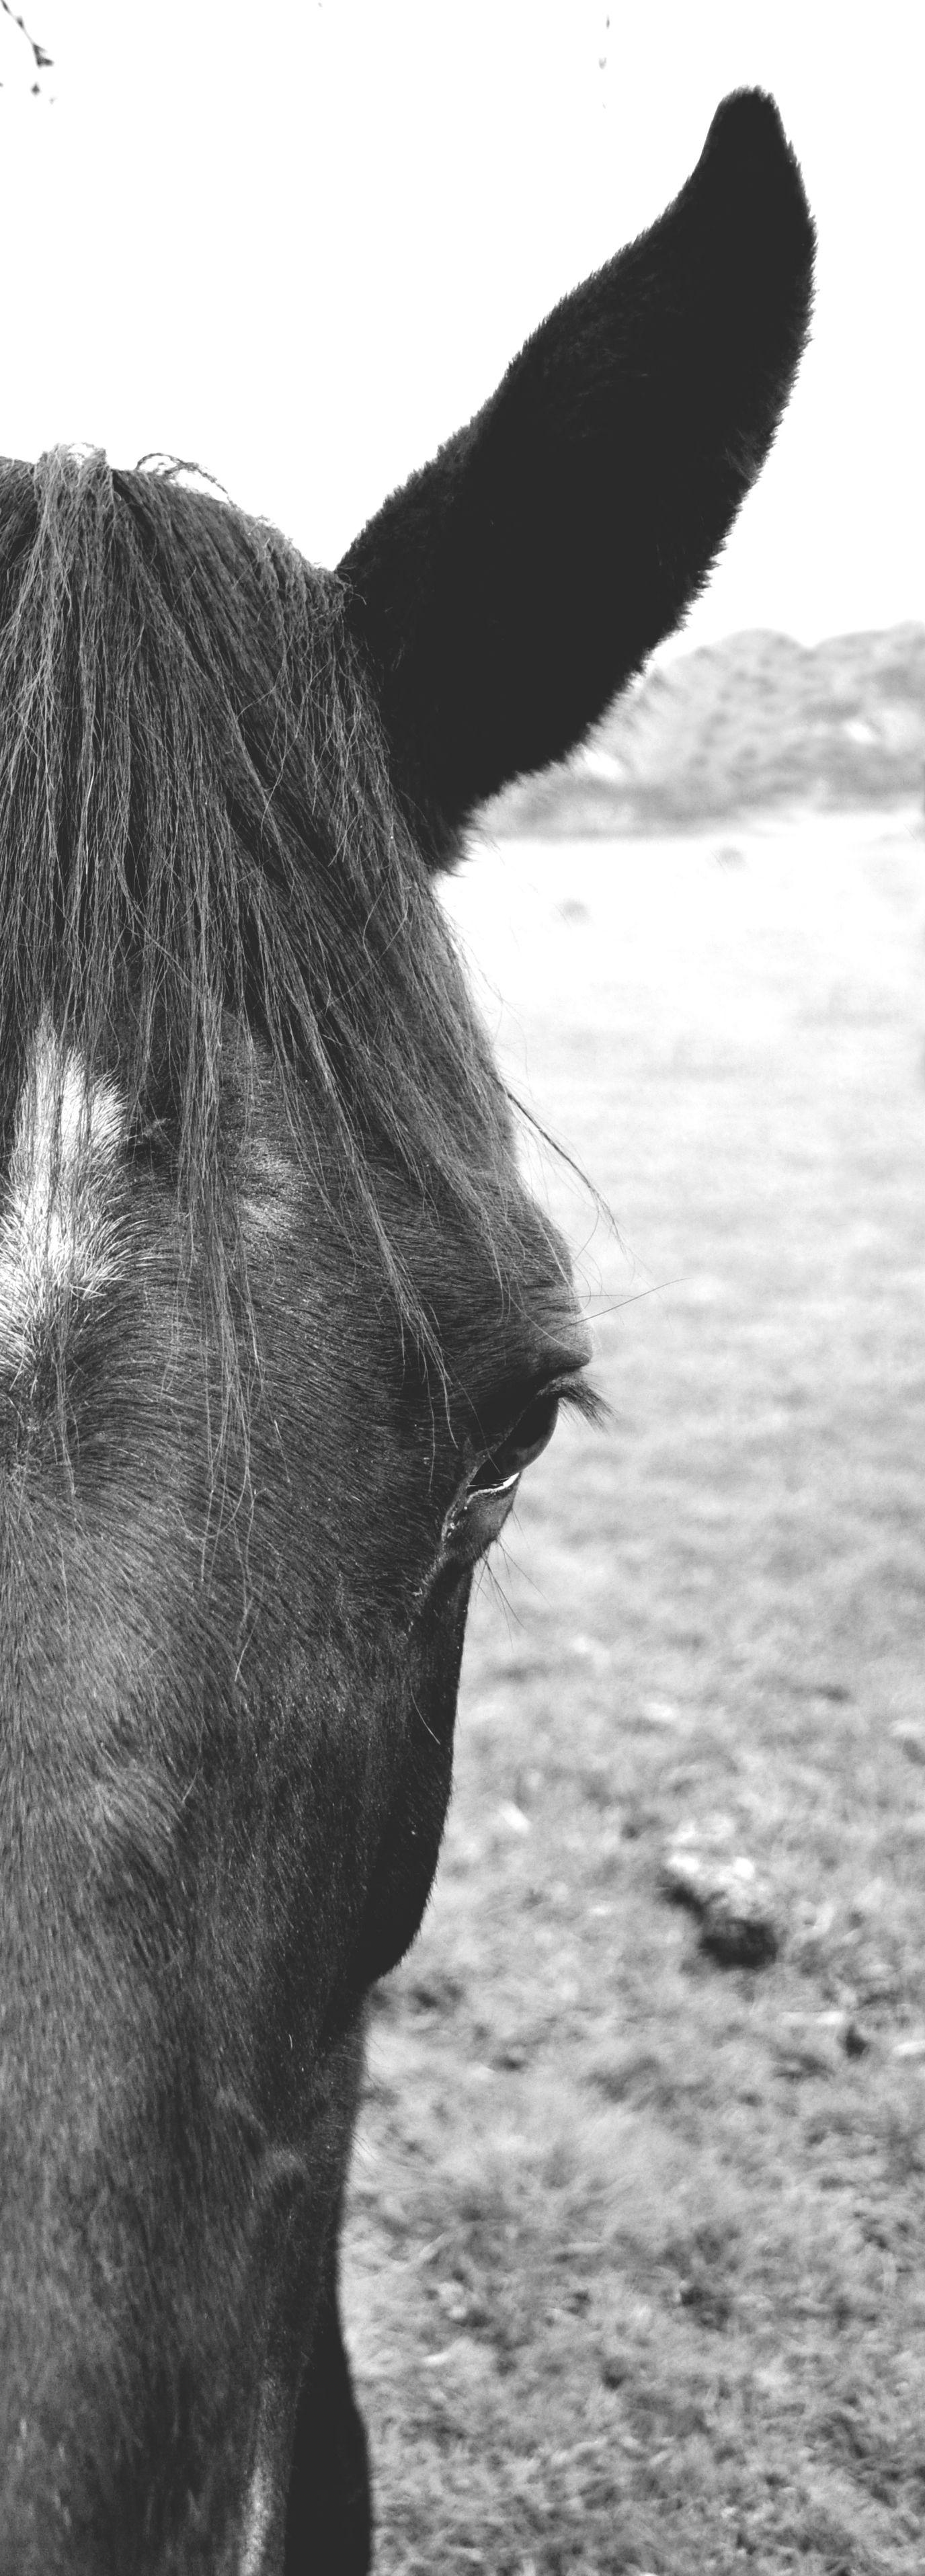 #horse #blackandwhite #black #beautiful #photography